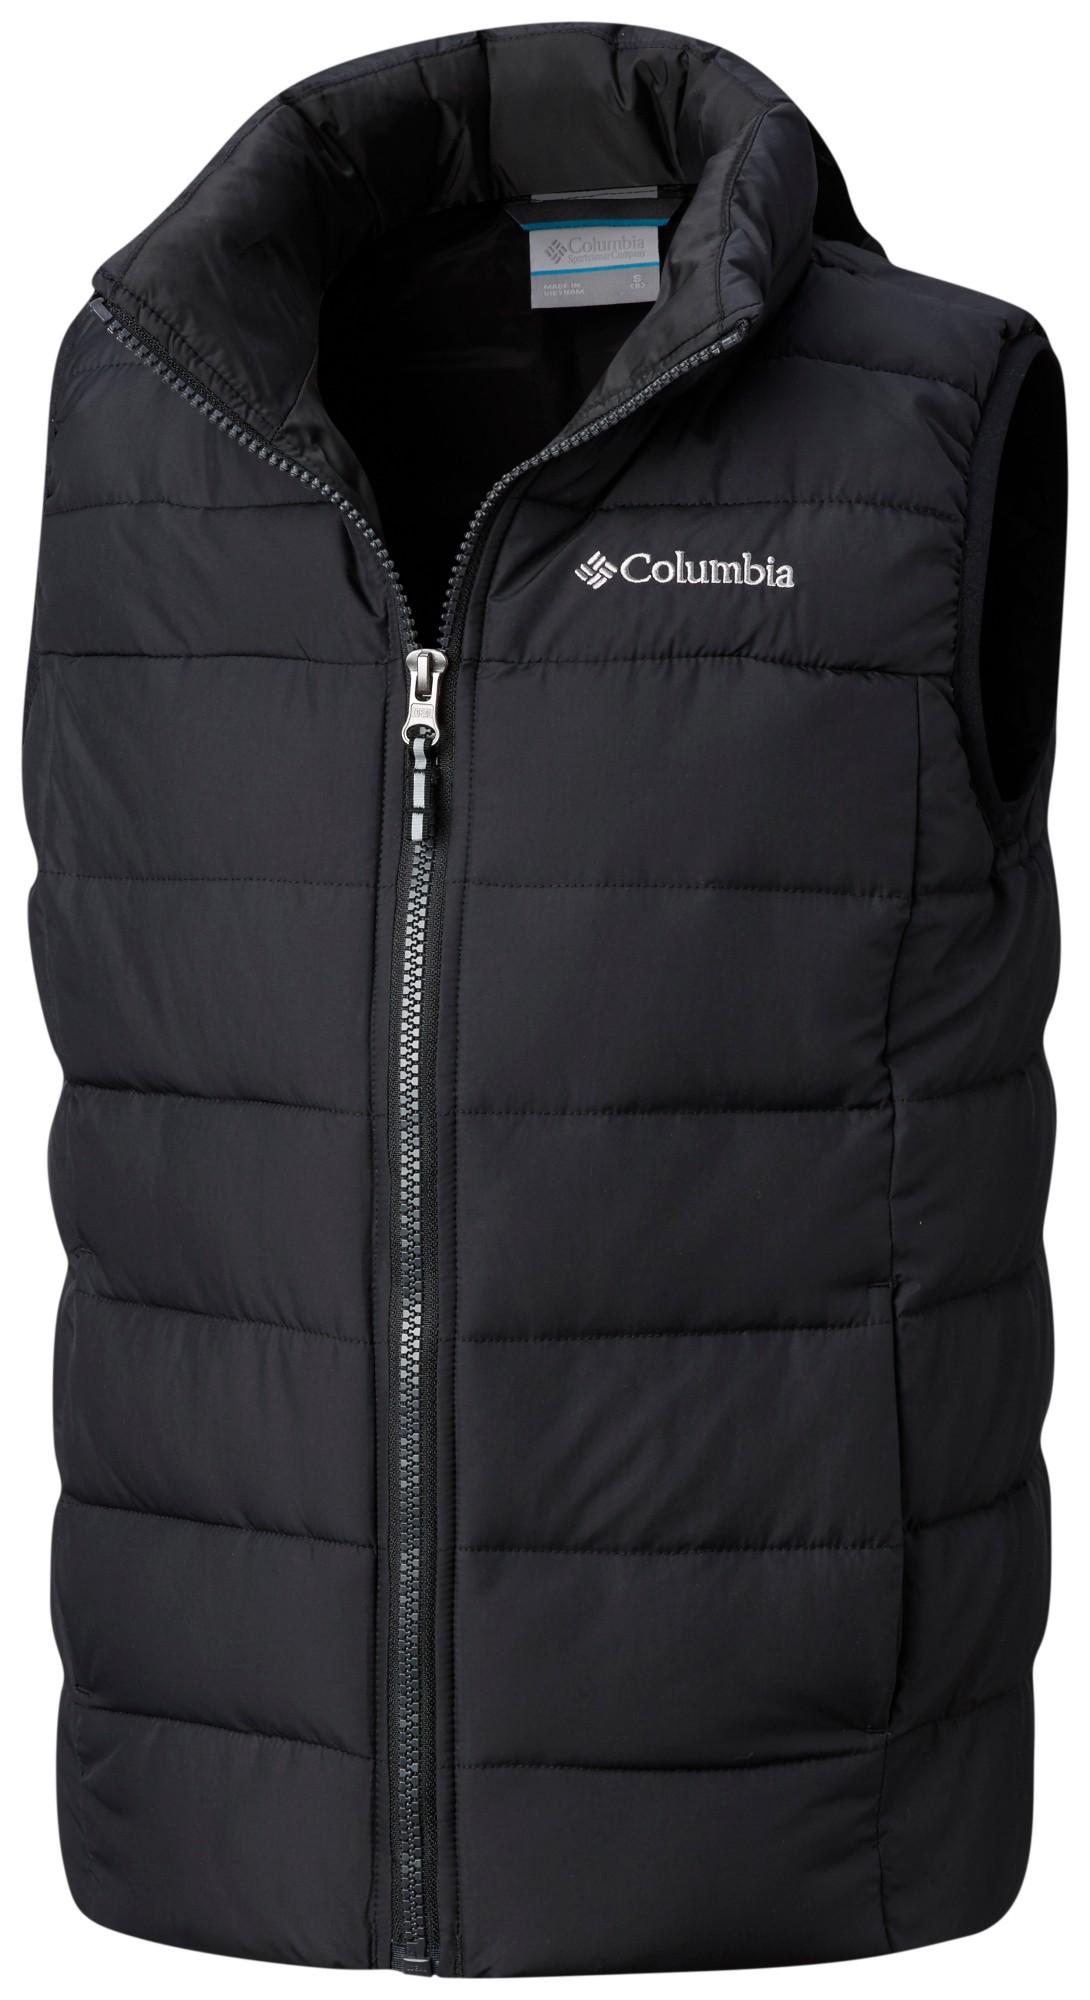 Columbia Powder LitePuffer Vest Black 164